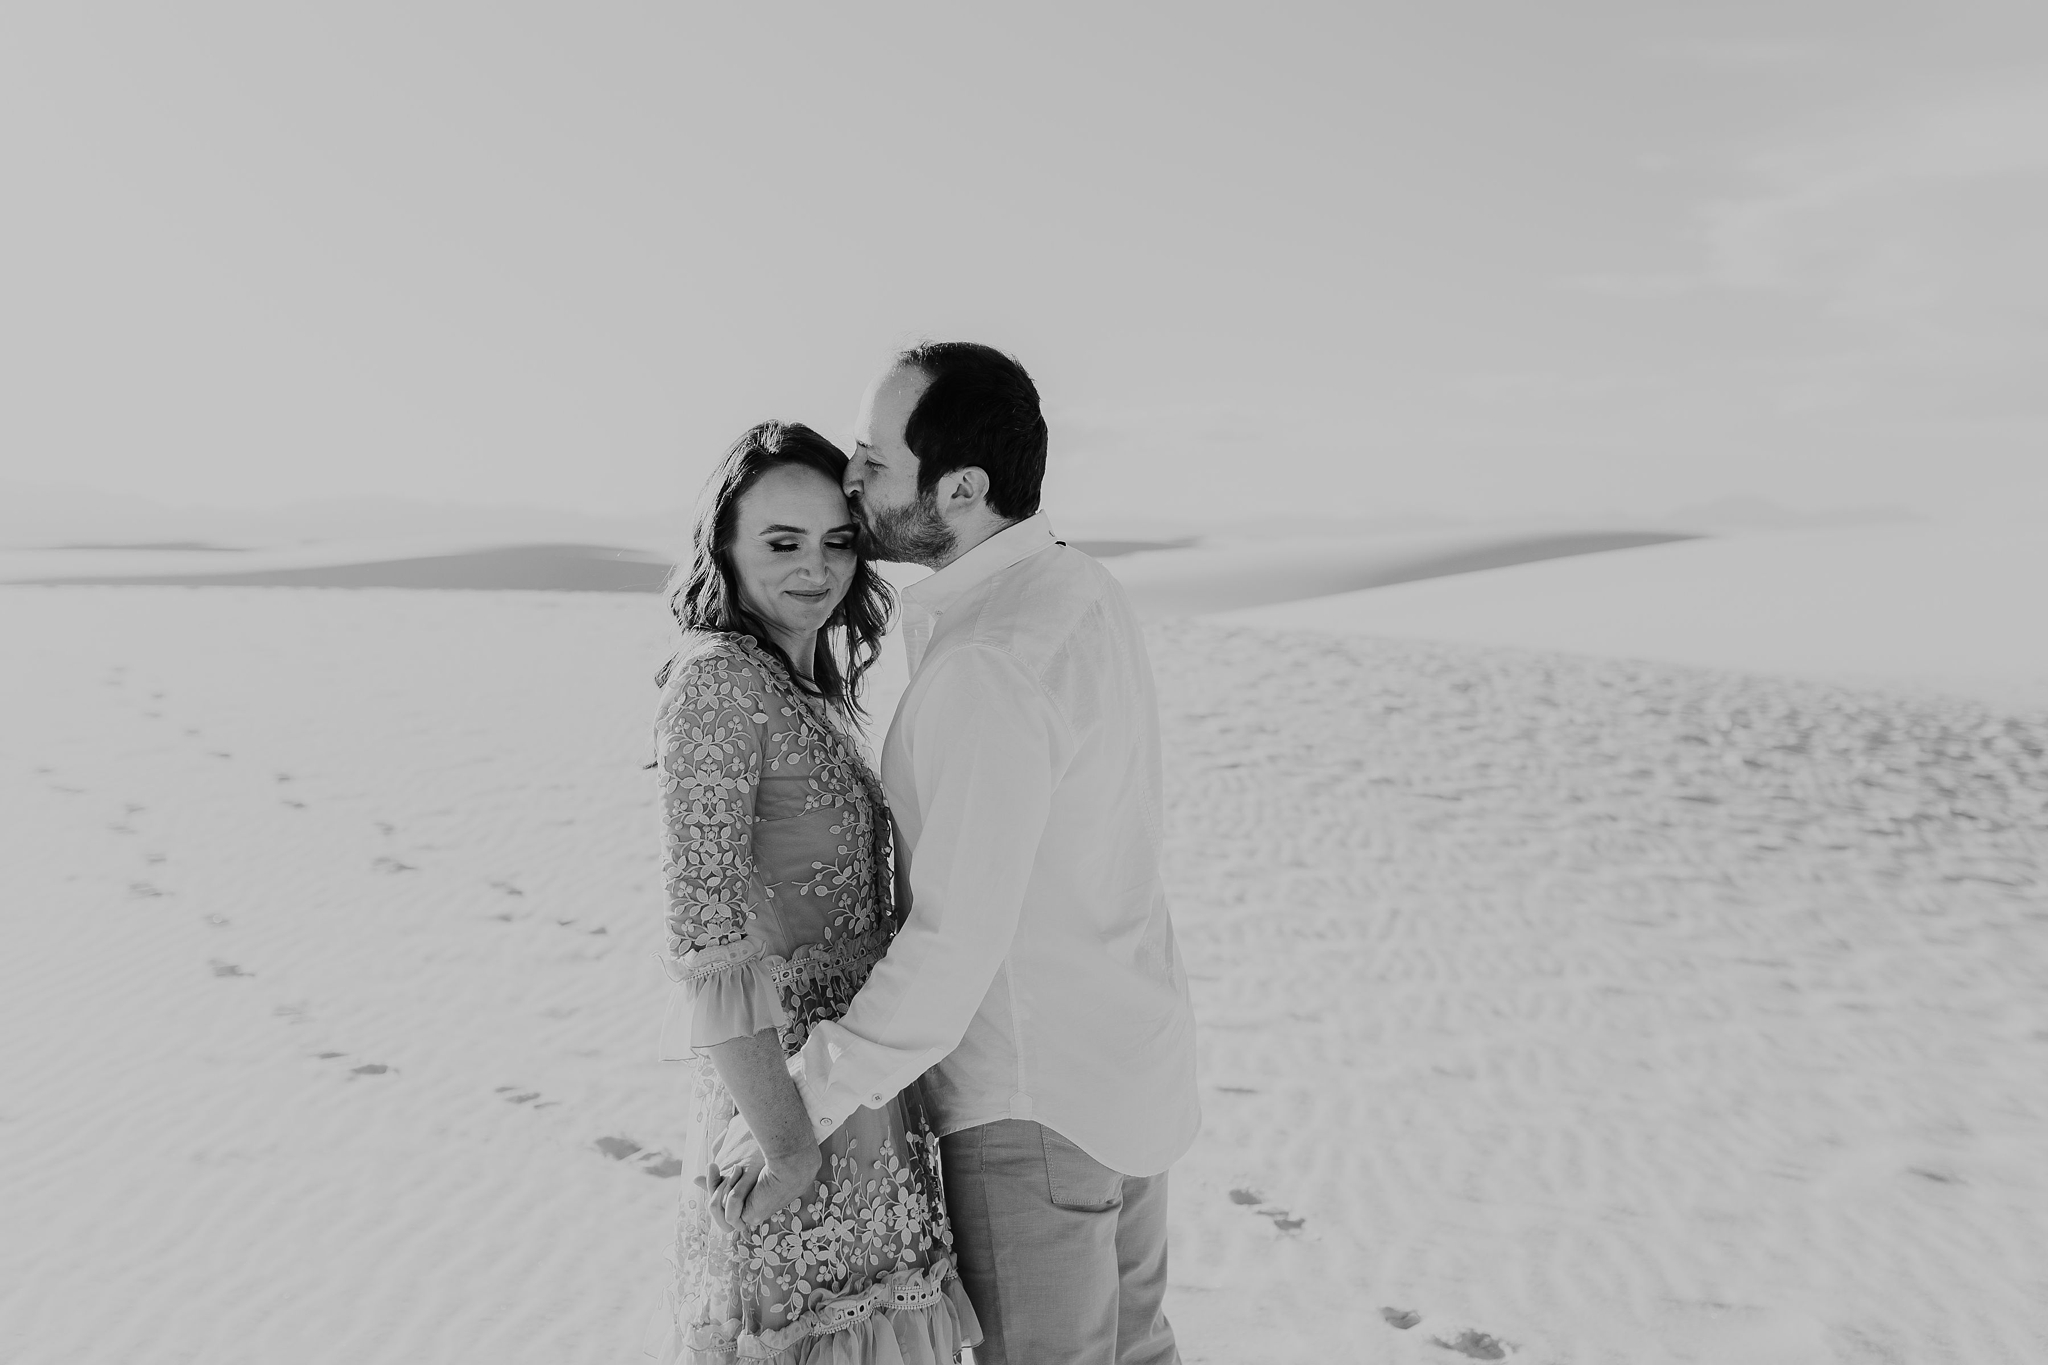 Alicia+lucia+photography+-+albuquerque+wedding+photographer+-+santa+fe+wedding+photography+-+new+mexico+wedding+photographer+-+new+mexico+wedding+-+new+mexico+engagement+-+white+sands+engagement+-+white+sands+national+monument_0014.jpg